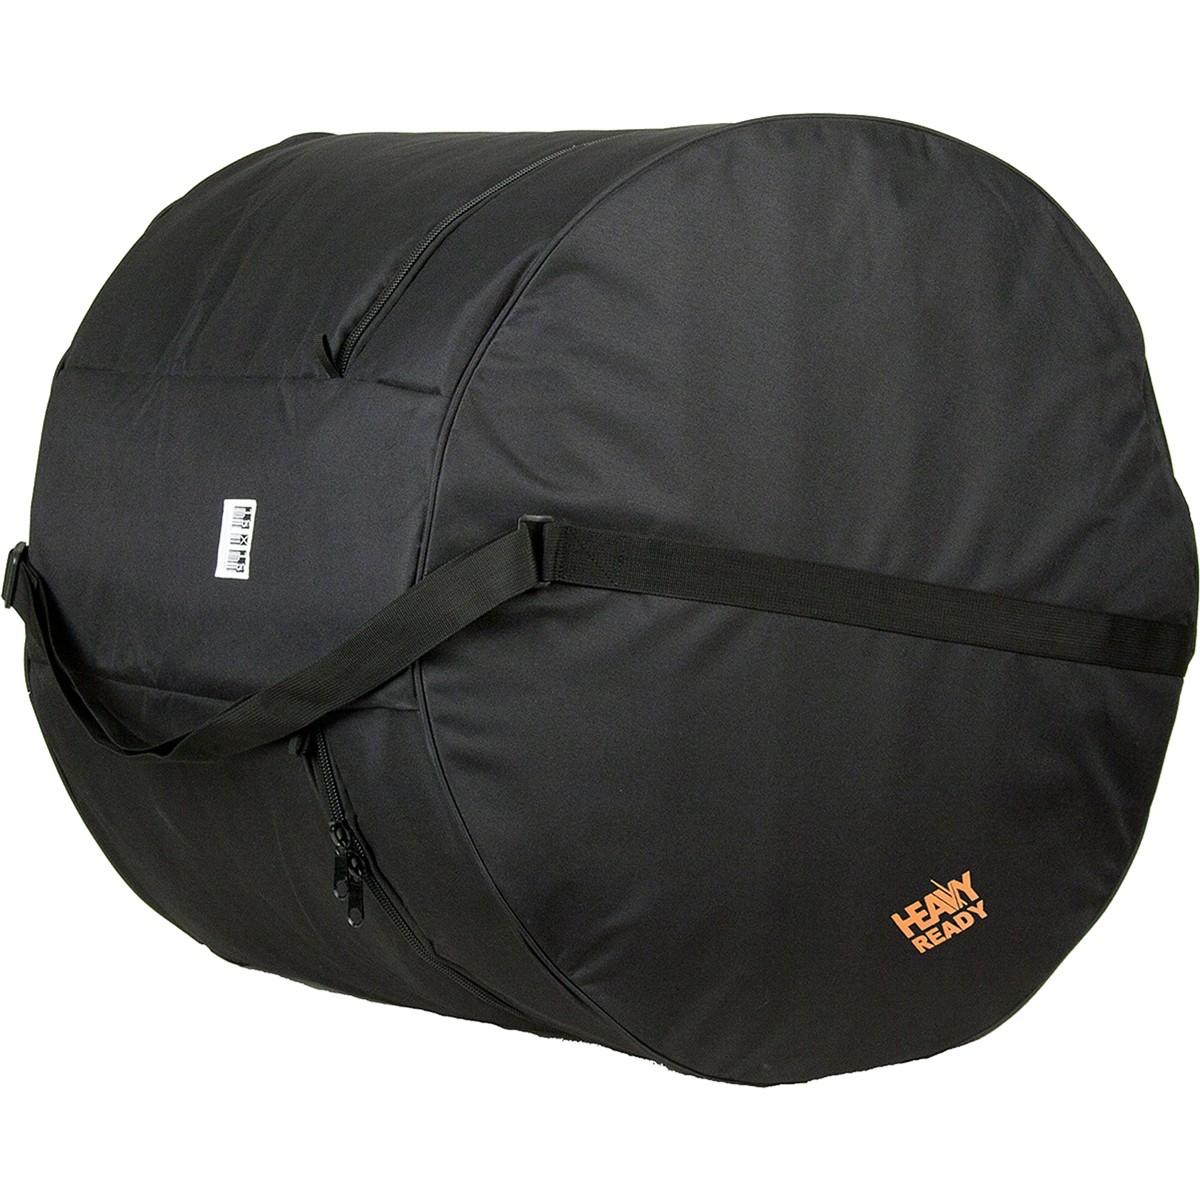 Protec Heavy Ready SeriesPadded Tom Bag 16″ x 16″ (HR1616)